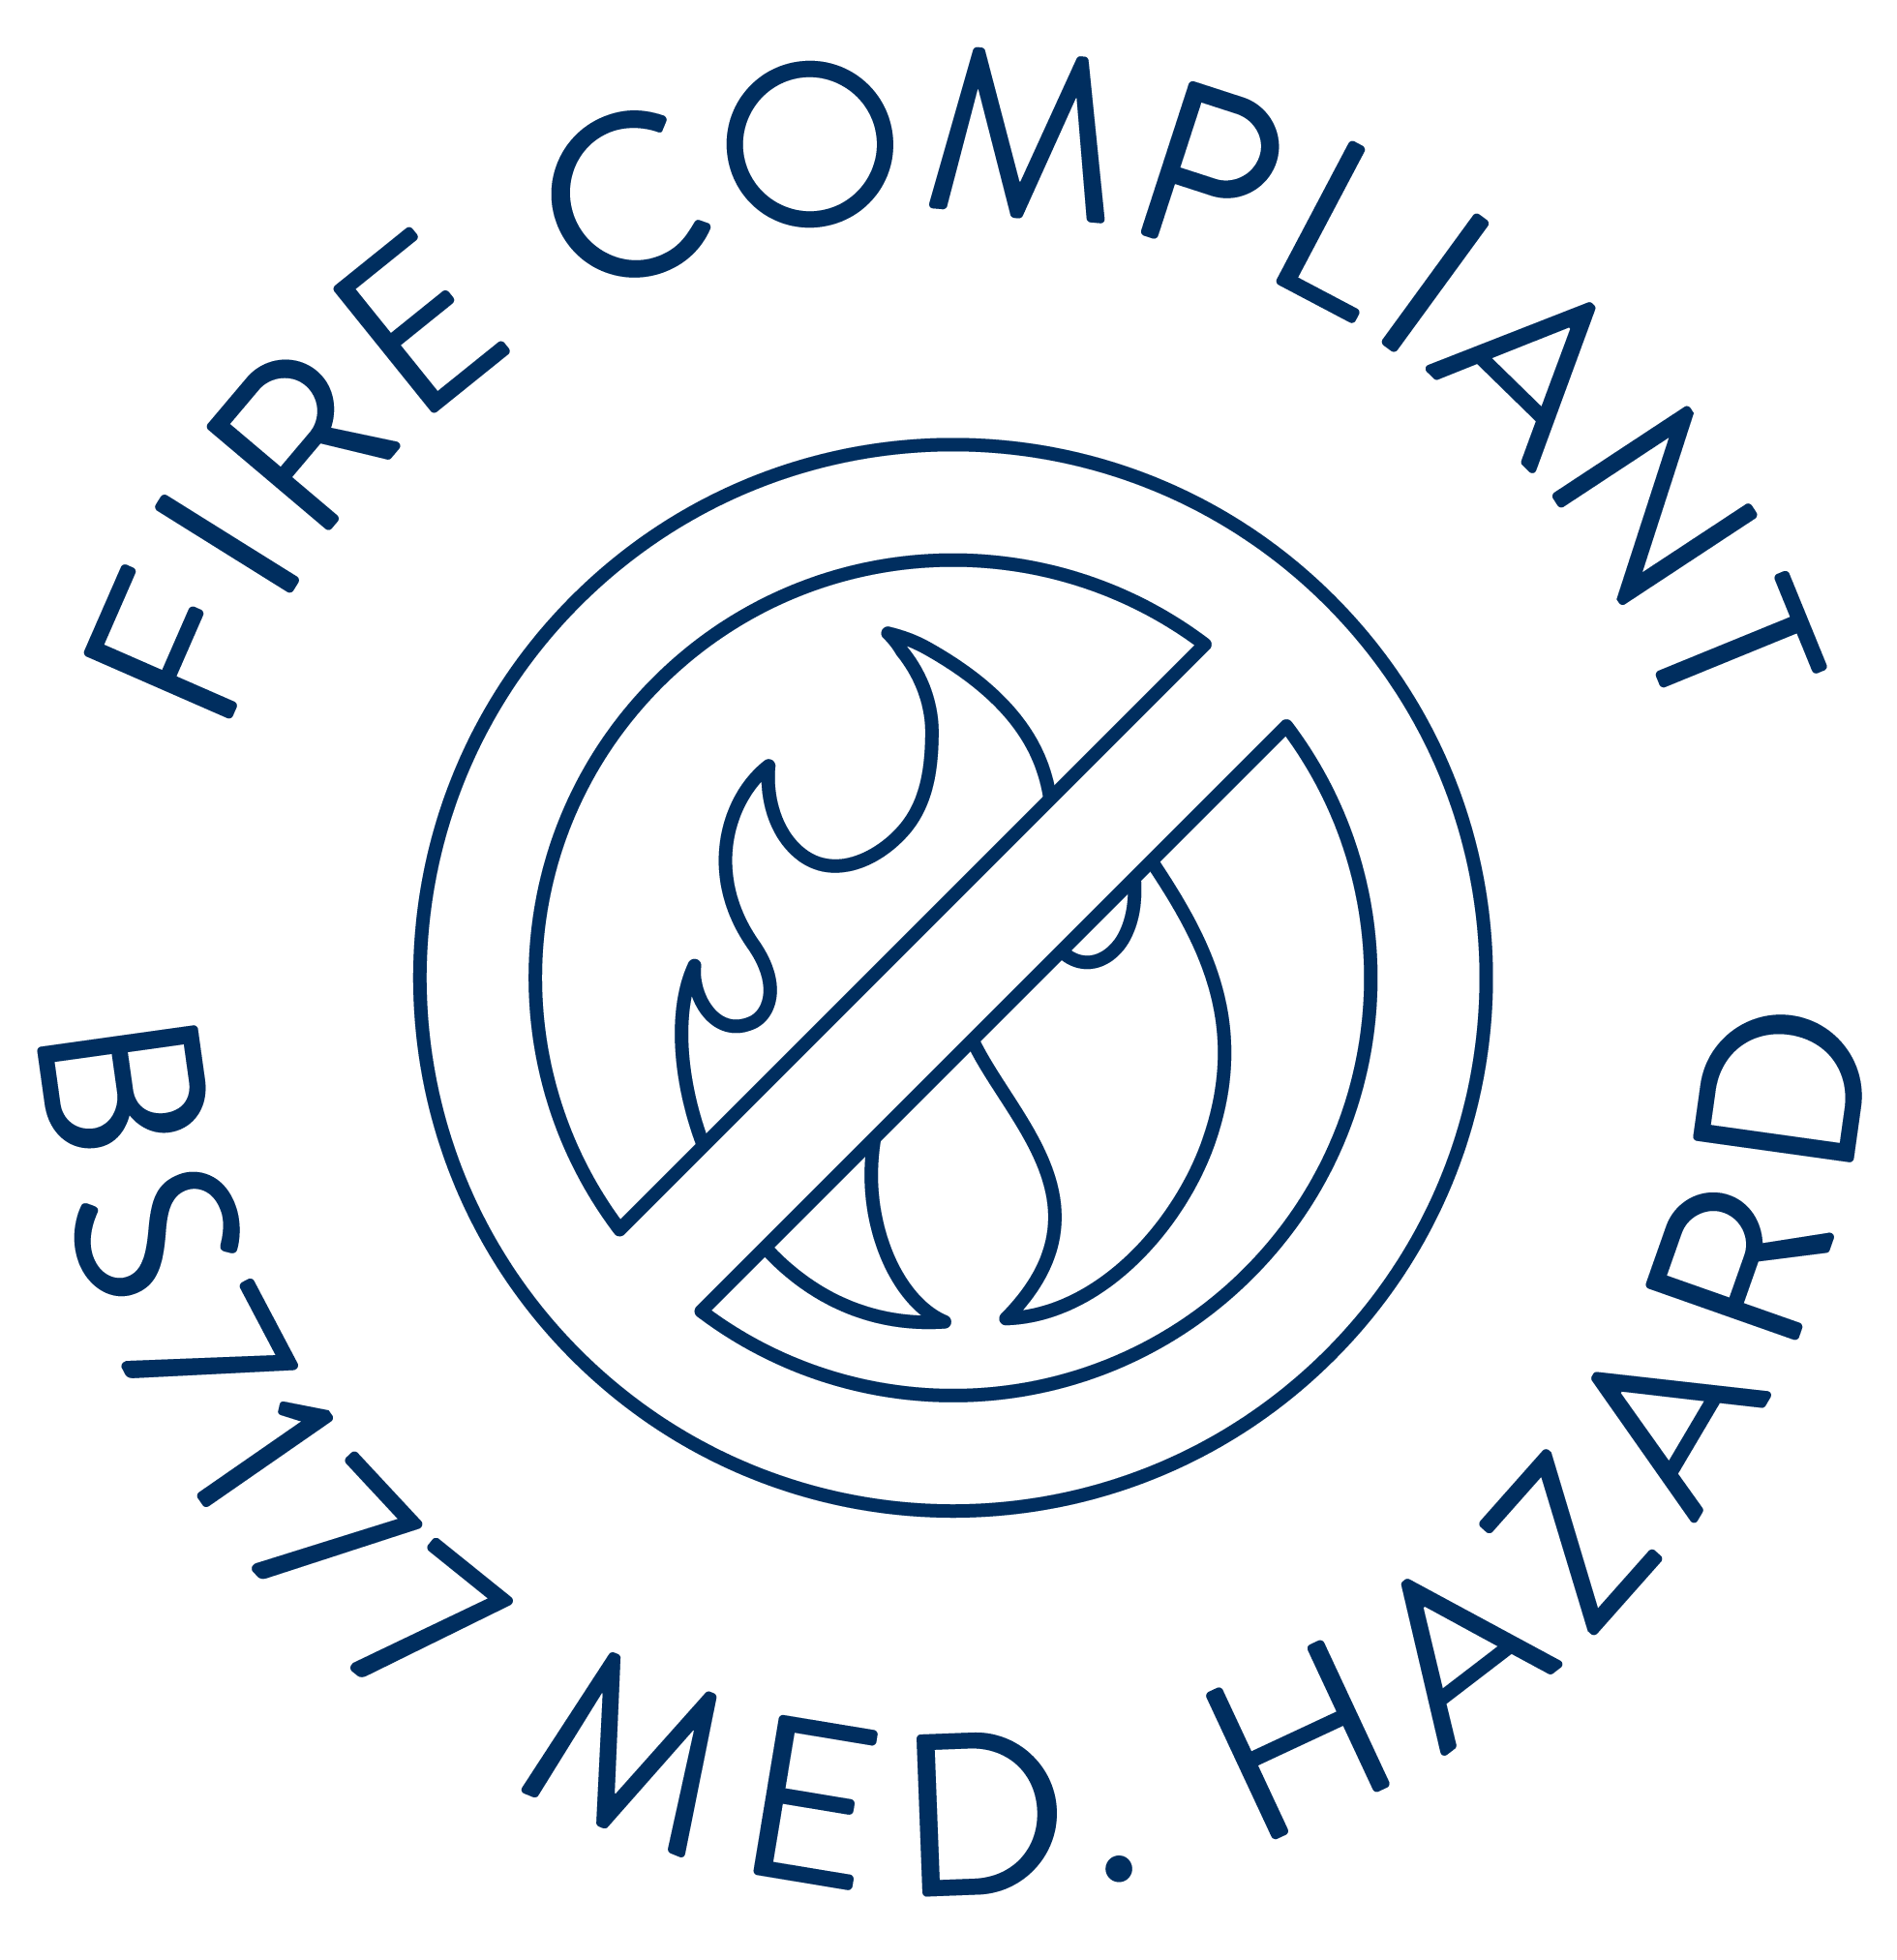 Fire_Compliant_NAVY-e1583313513234